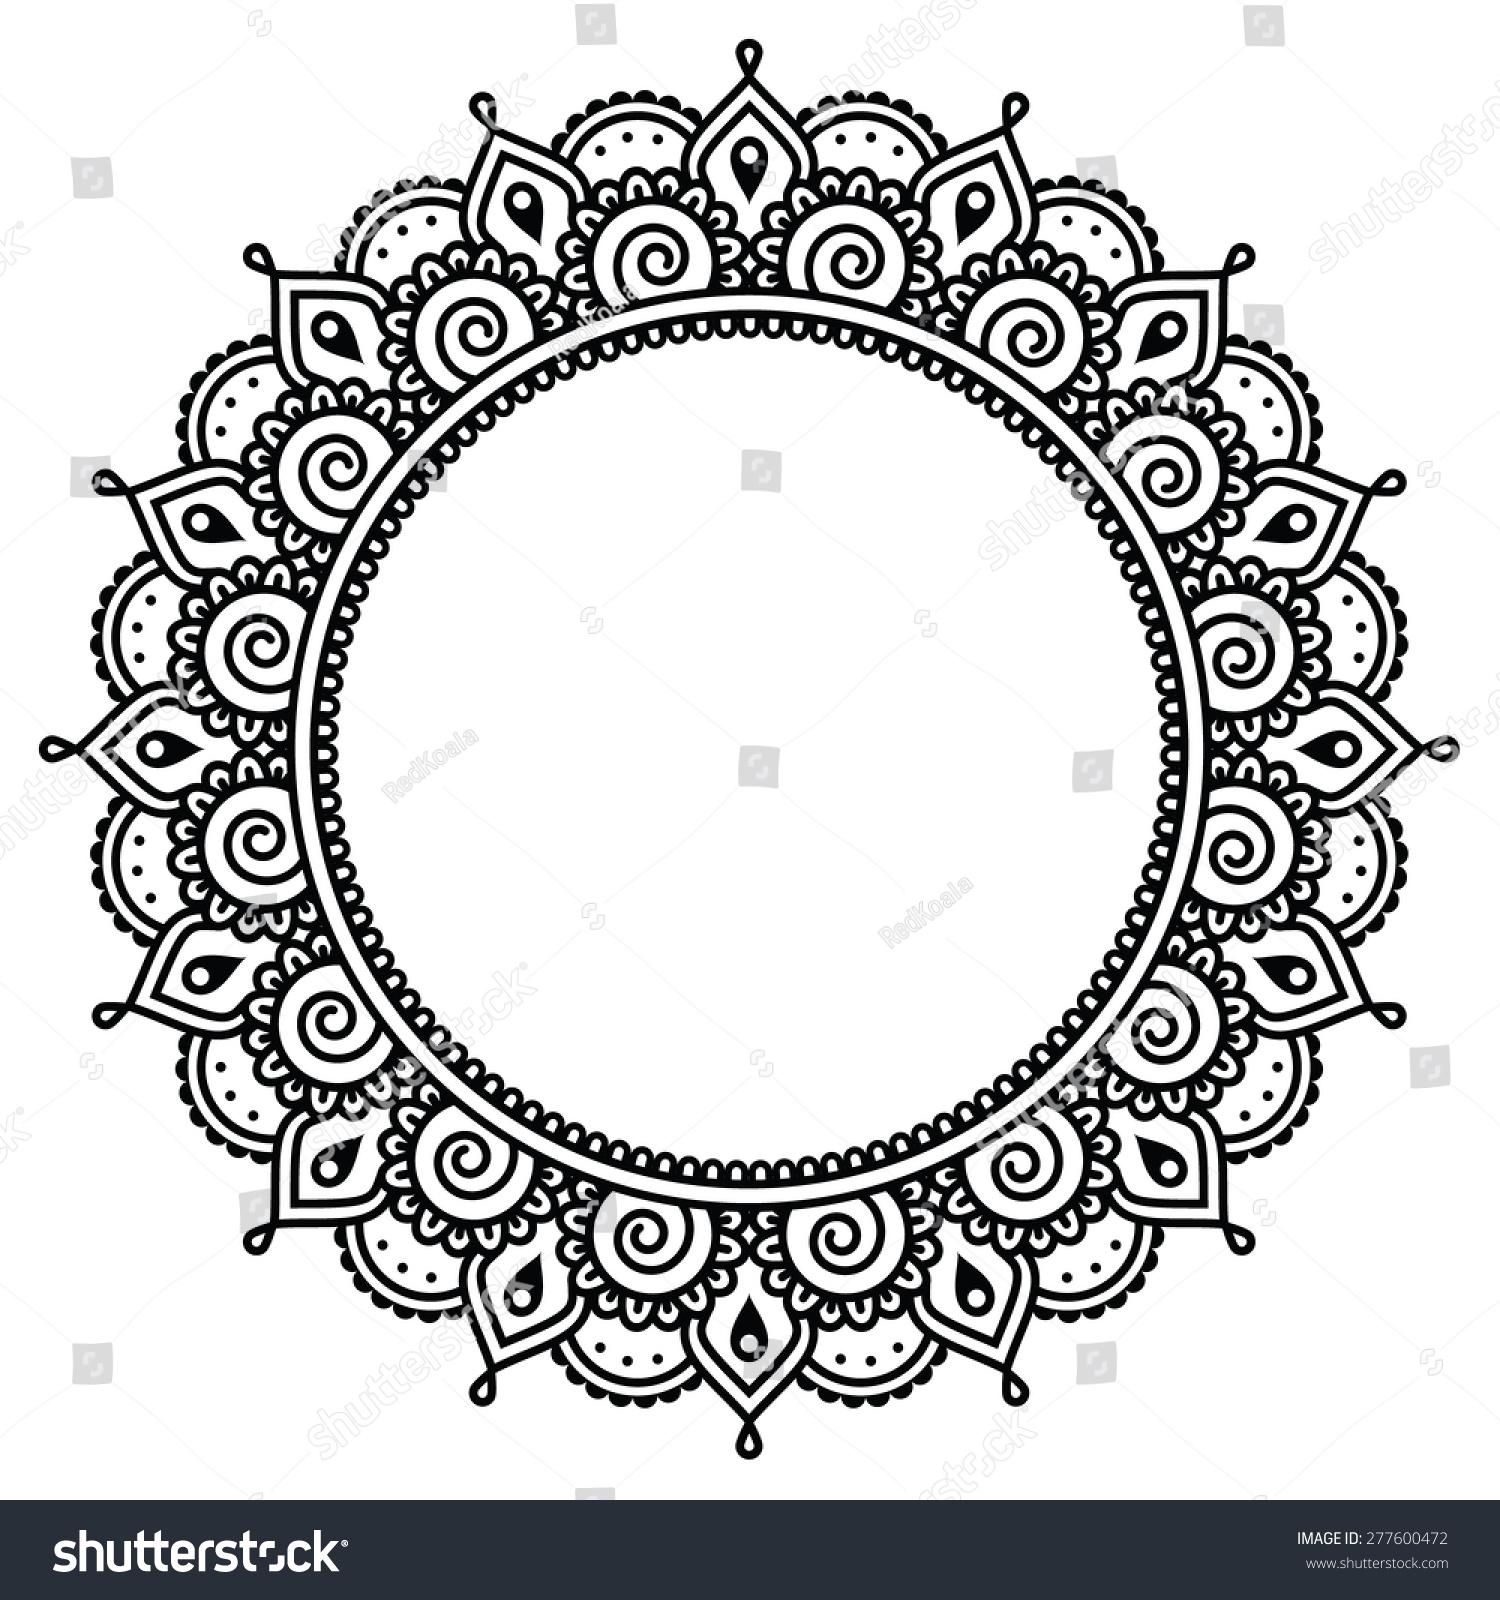 Mehndi Indian Henna Tattoo Round Pattern Stock Vector Royalty Free